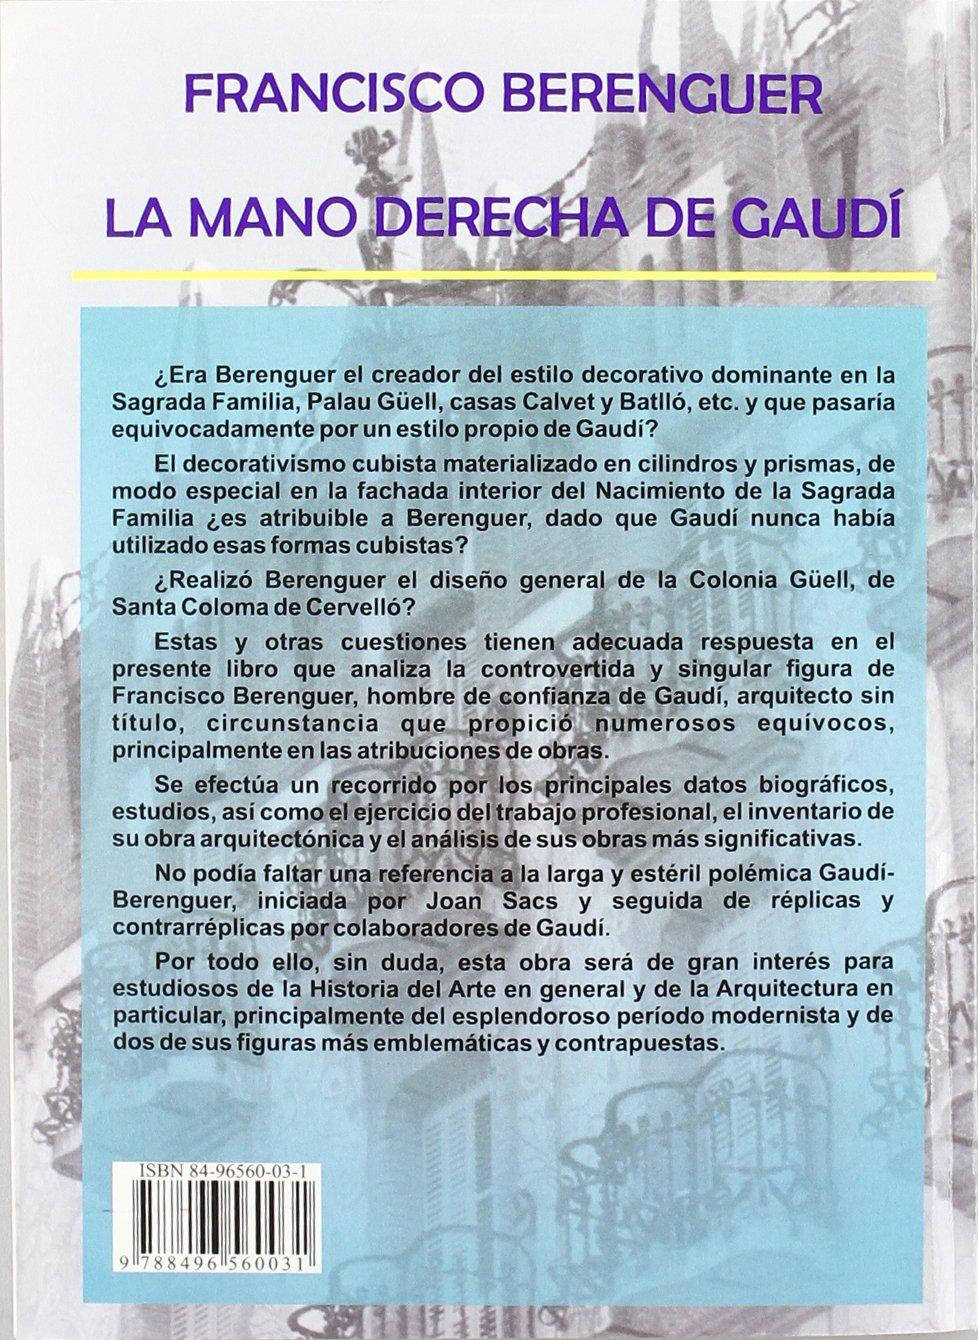 FRANCISCO BERENGUER MANO DCHA DE GAUDI: Jose Luis Ros Perez: 9788496560031: Amazon.com: Books